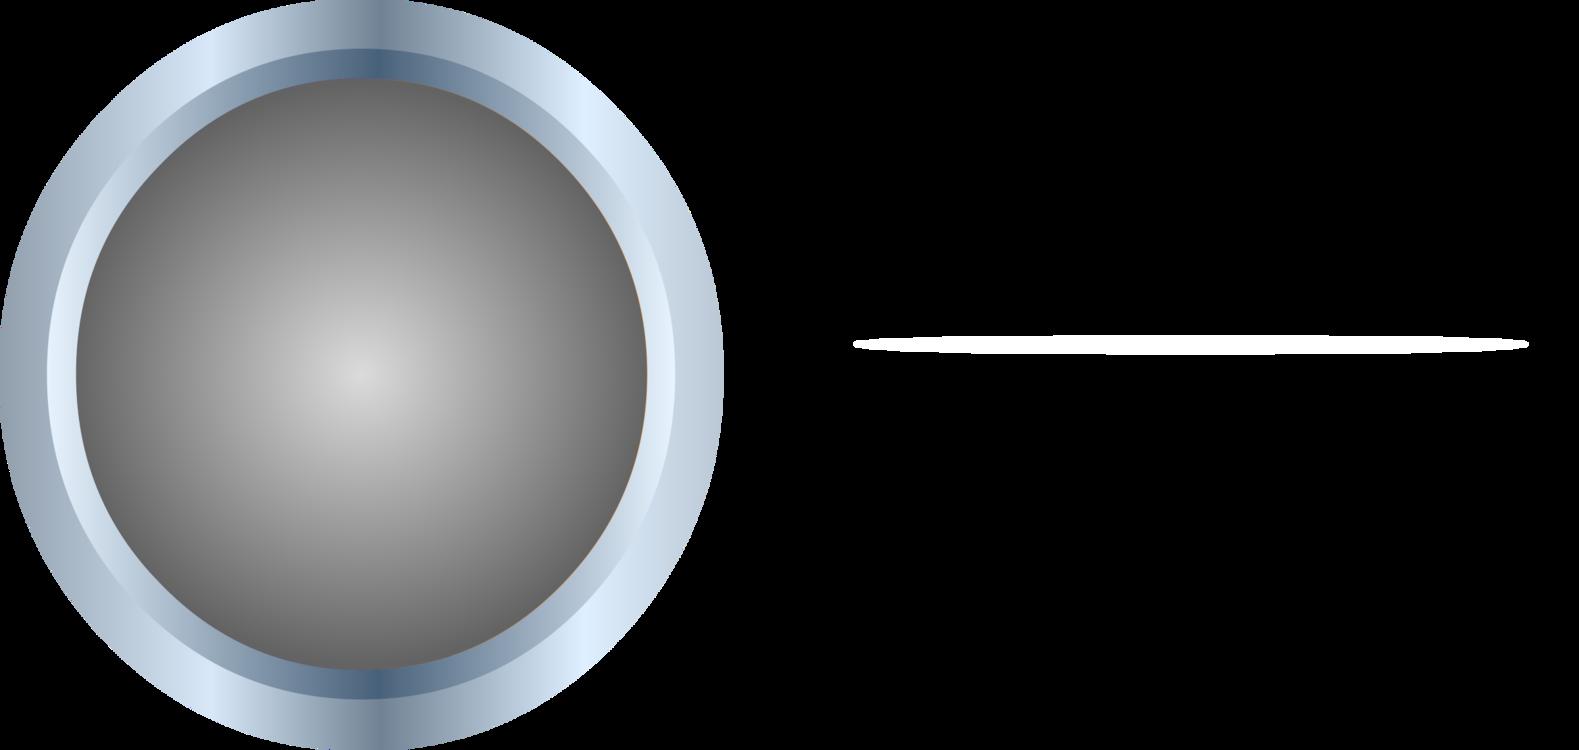 Window,Angle,Circle